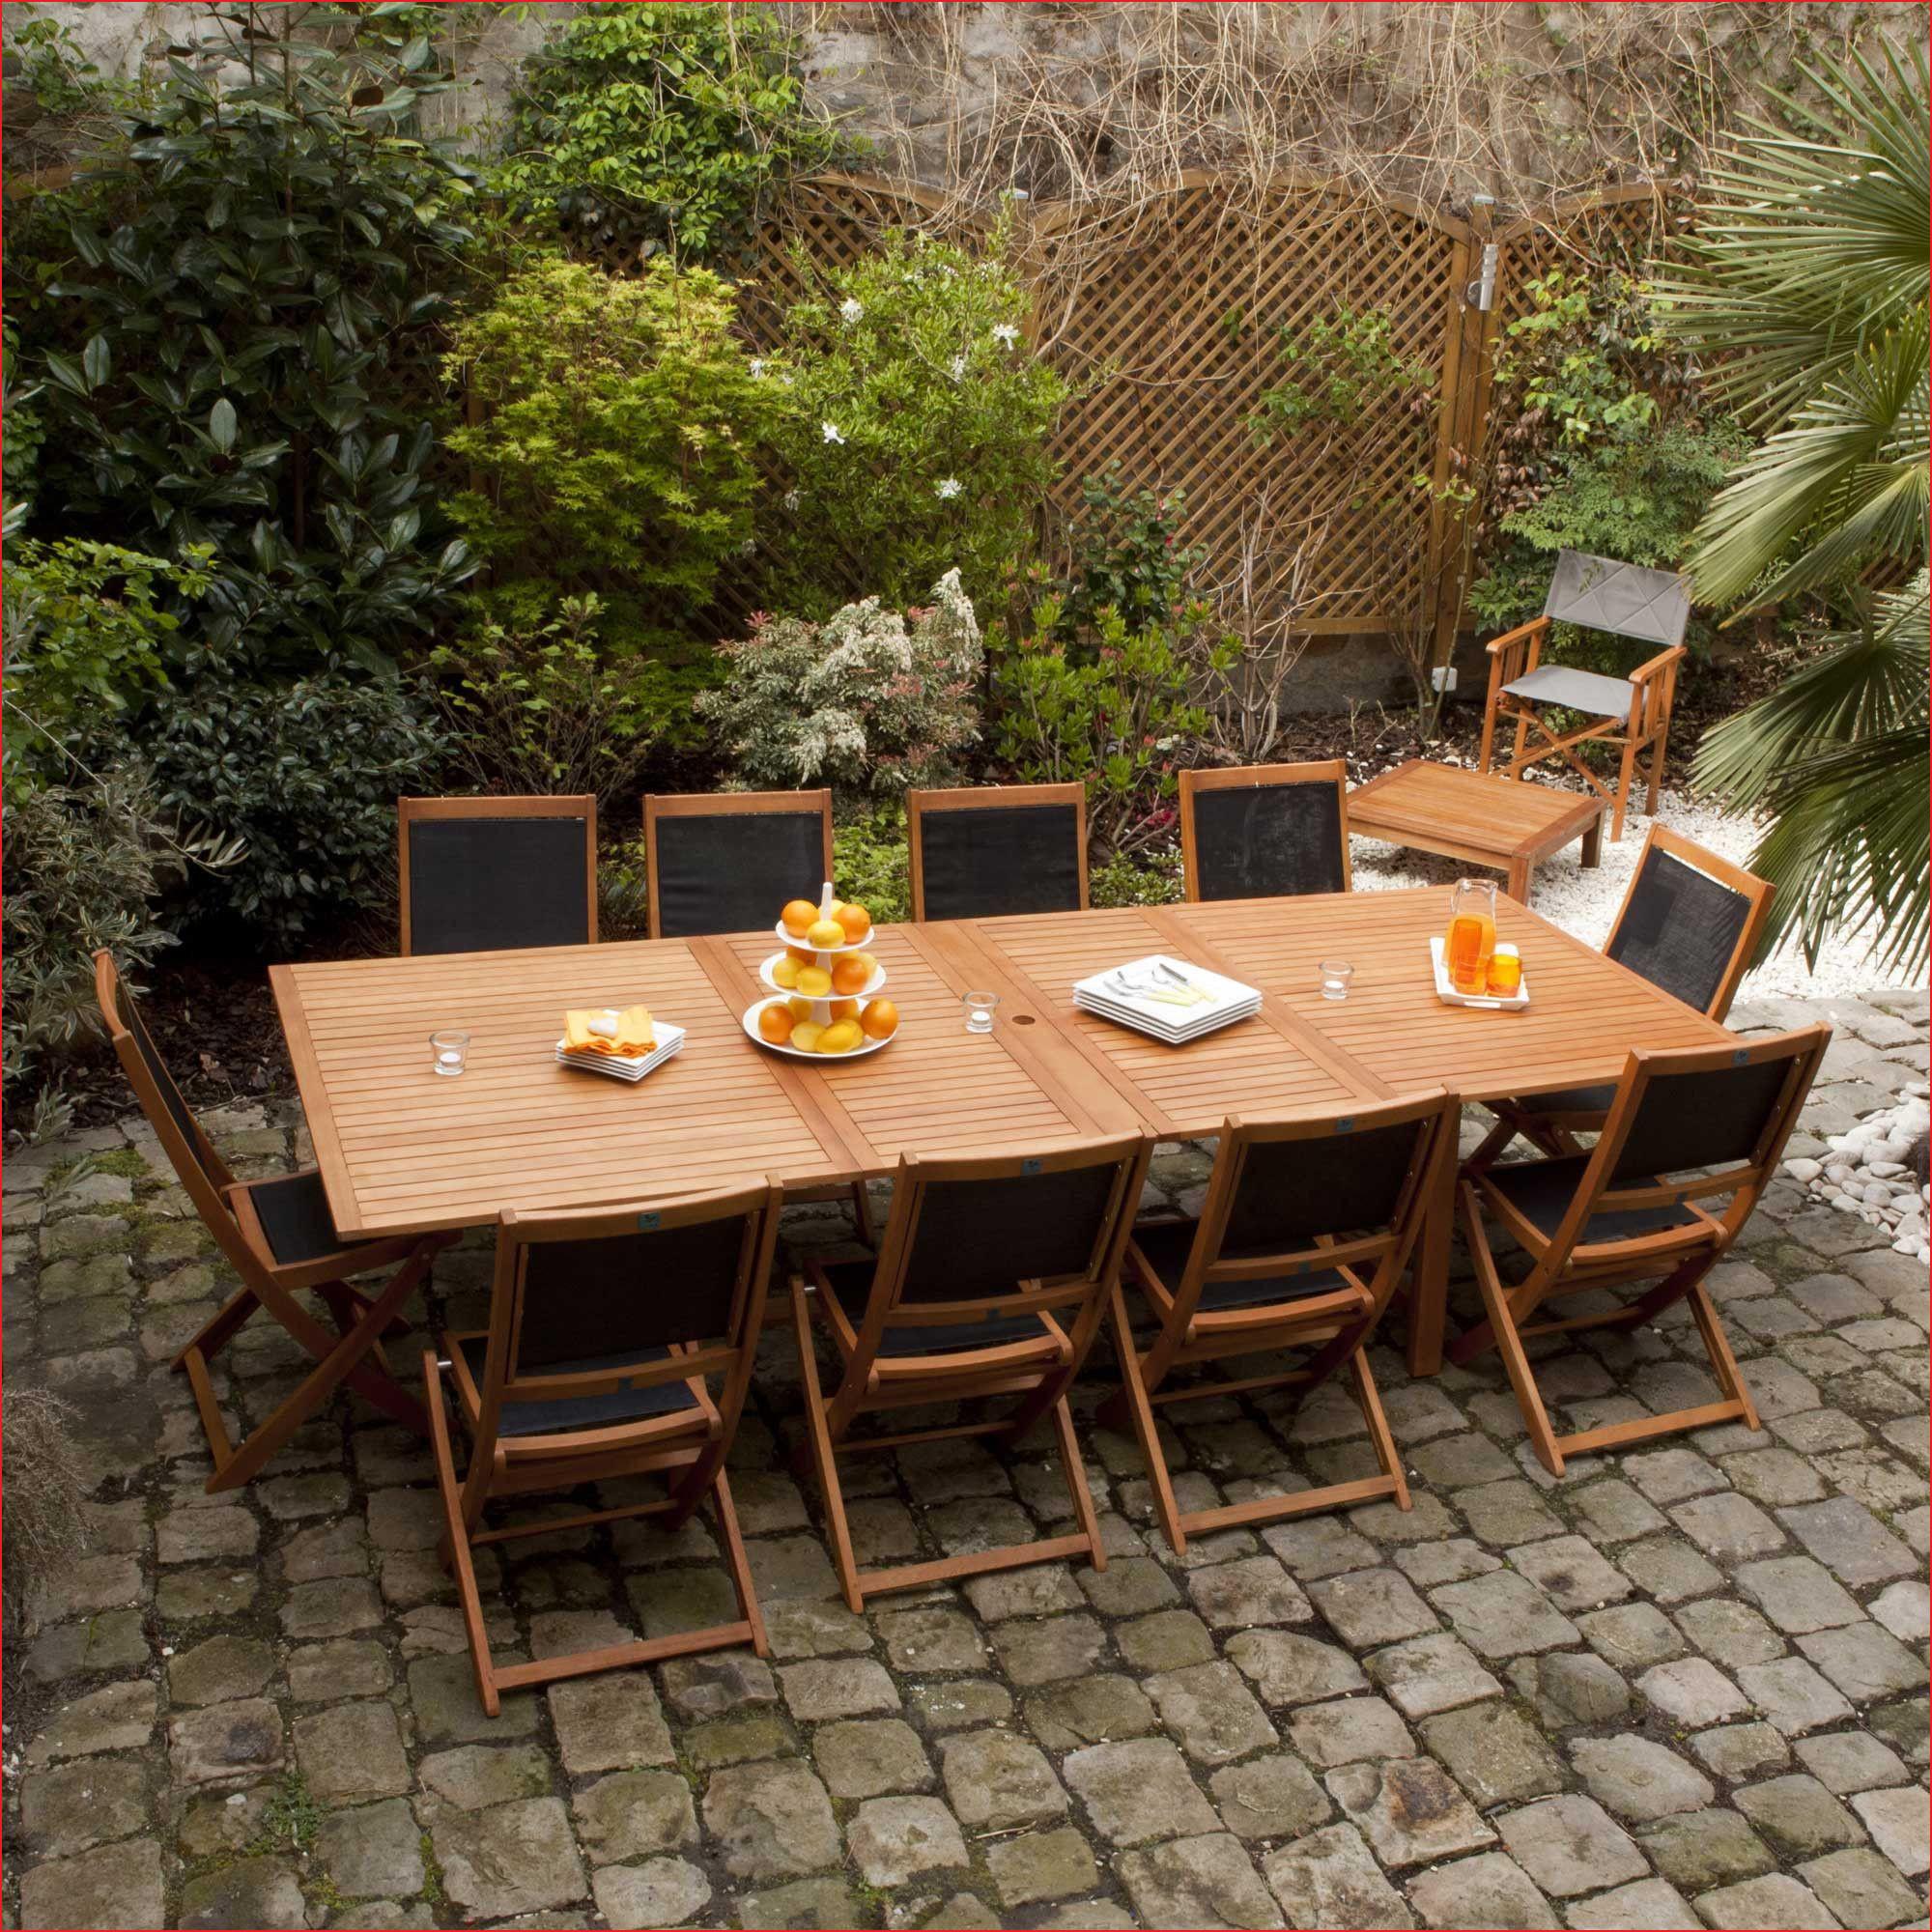 23 Génial Table Exterieur Teck | Salon Jardin à Salon De Jardin Teck Solde